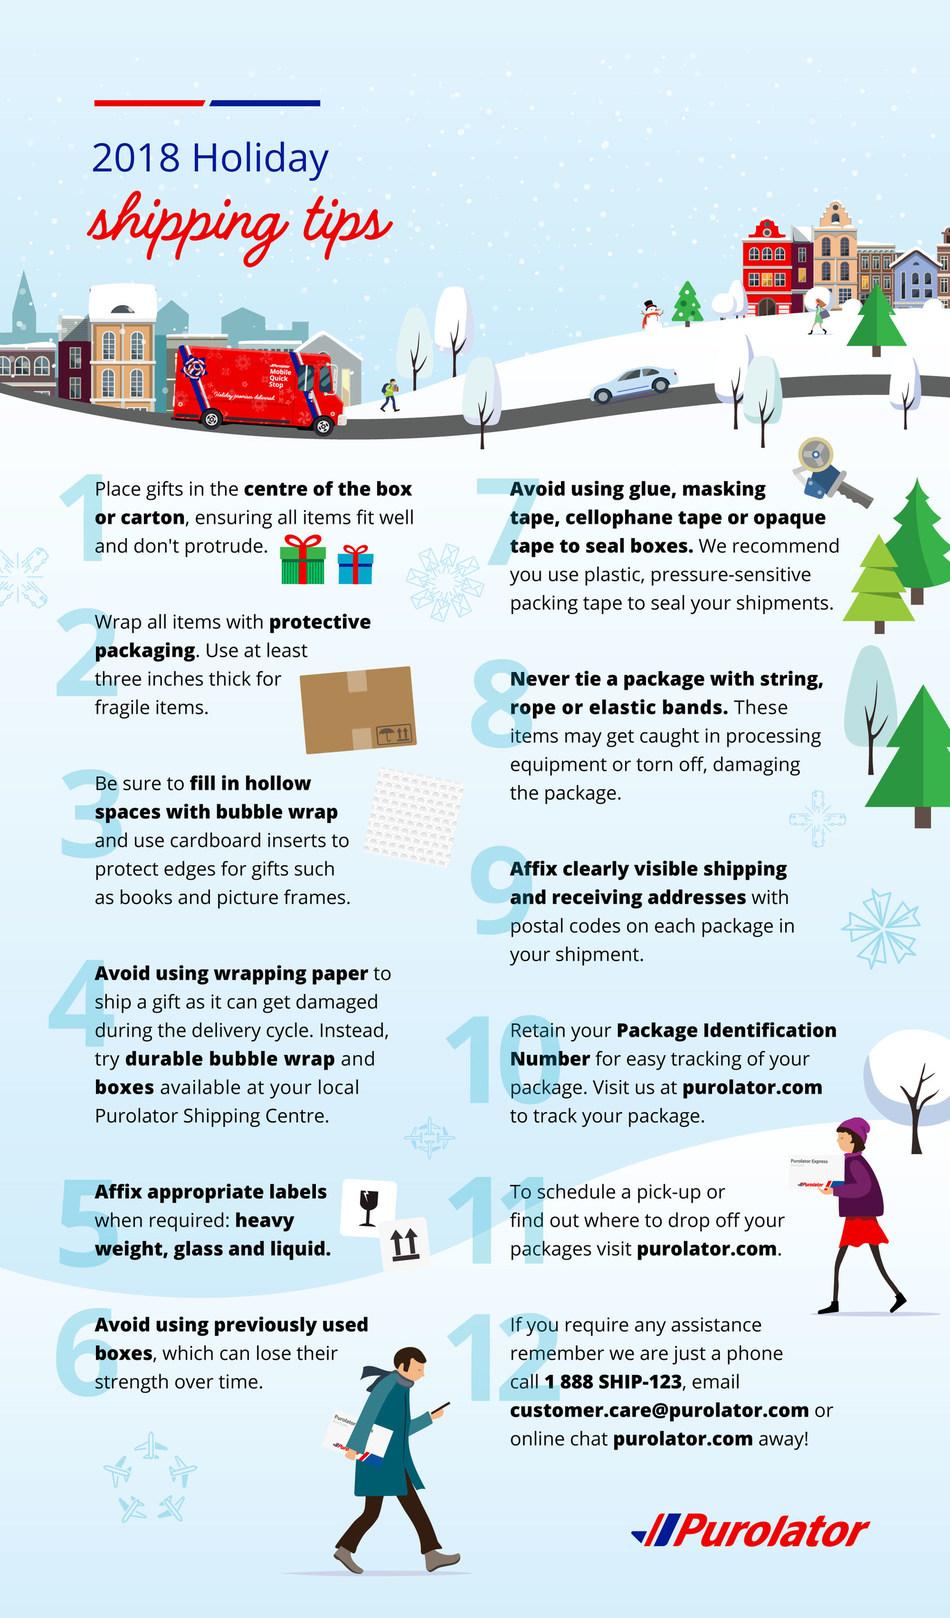 2018 Holiday shipping tips (CNW Group/Purolator Inc.)